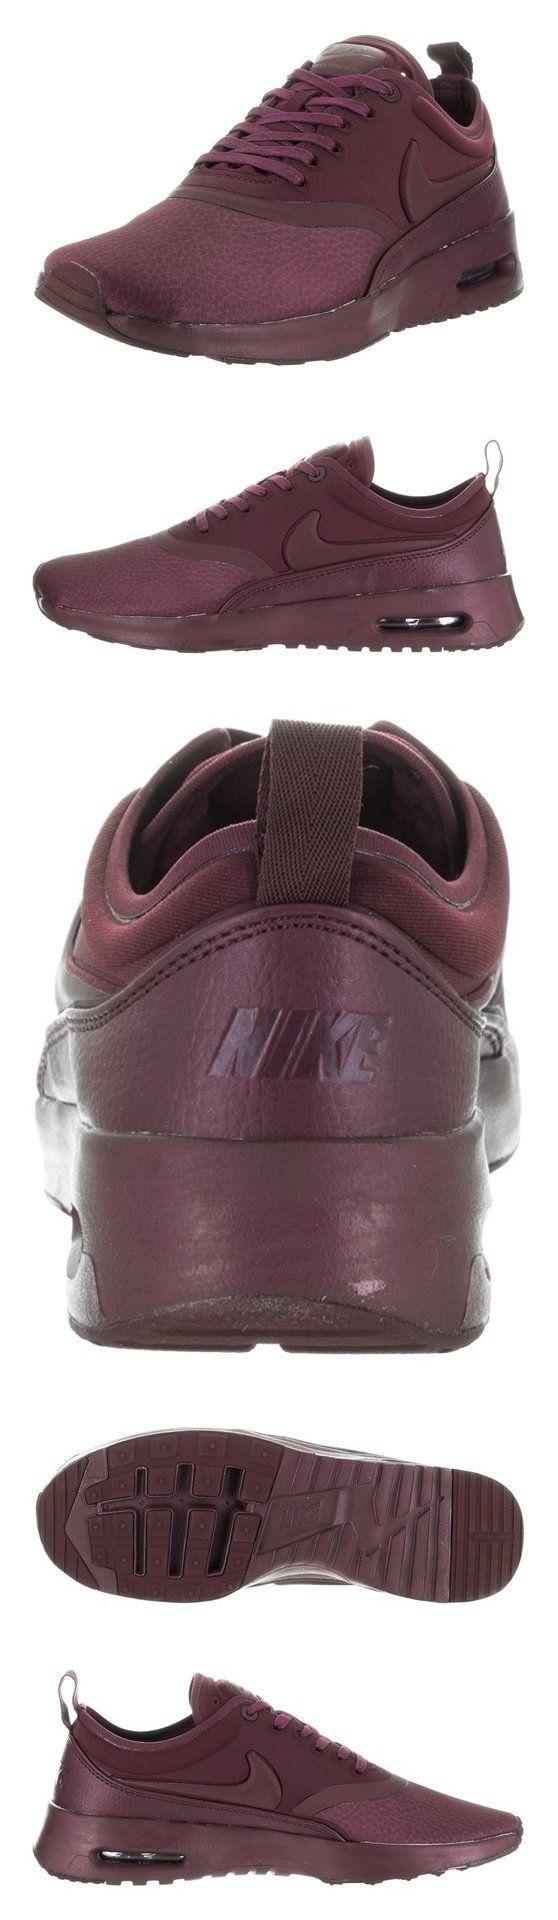 Nike Women's Air Max Thea Ultra Prm Night Maroon/Night Maroon Running Shoe 8 Women US #sports #shoes #nike